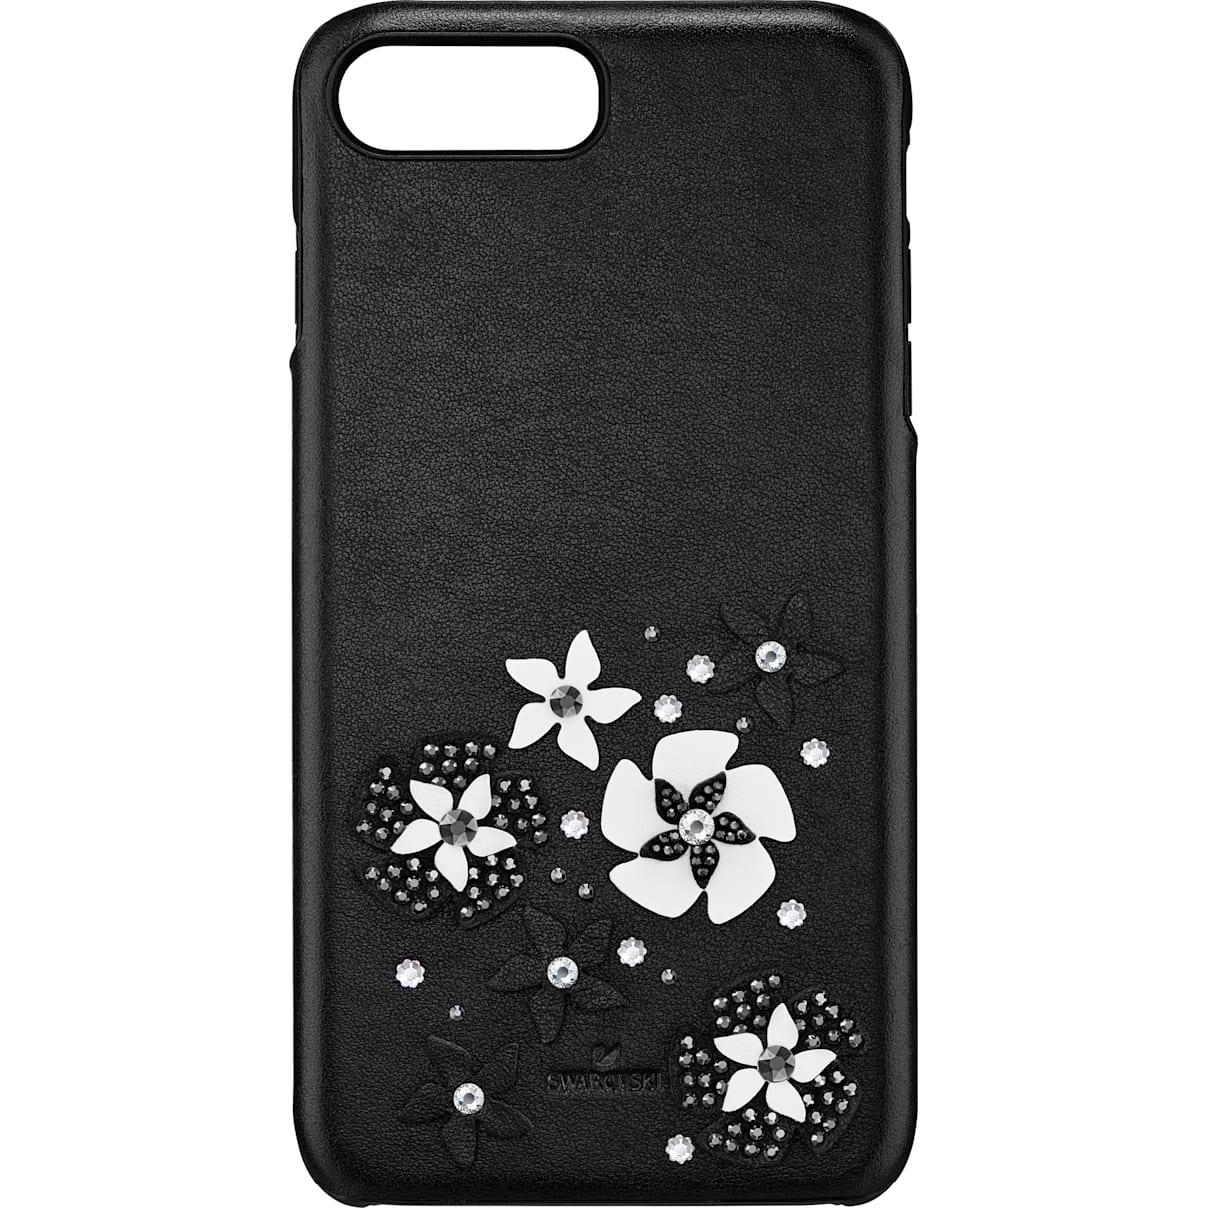 Swarovski Mazy Smartphone Case with integrated Bumper, iPhone® 8 Plus, Black